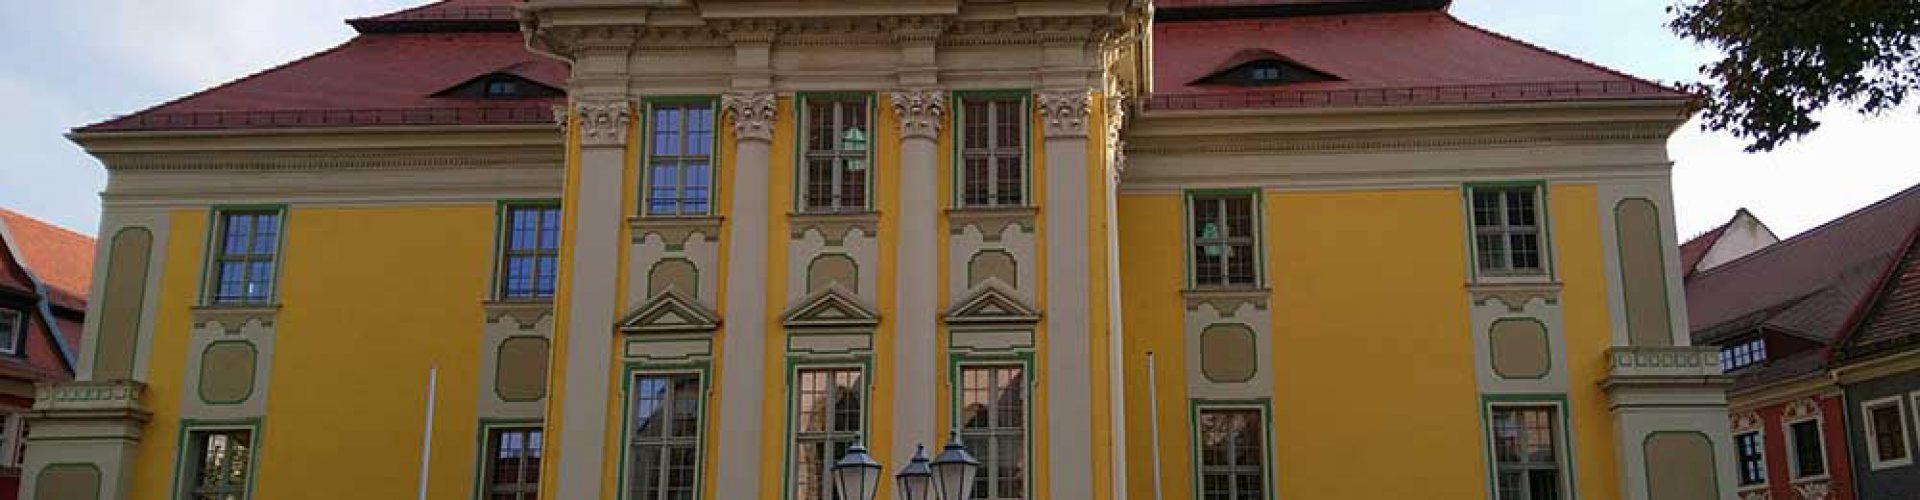 BT-Rathaus-1920x500.jpg